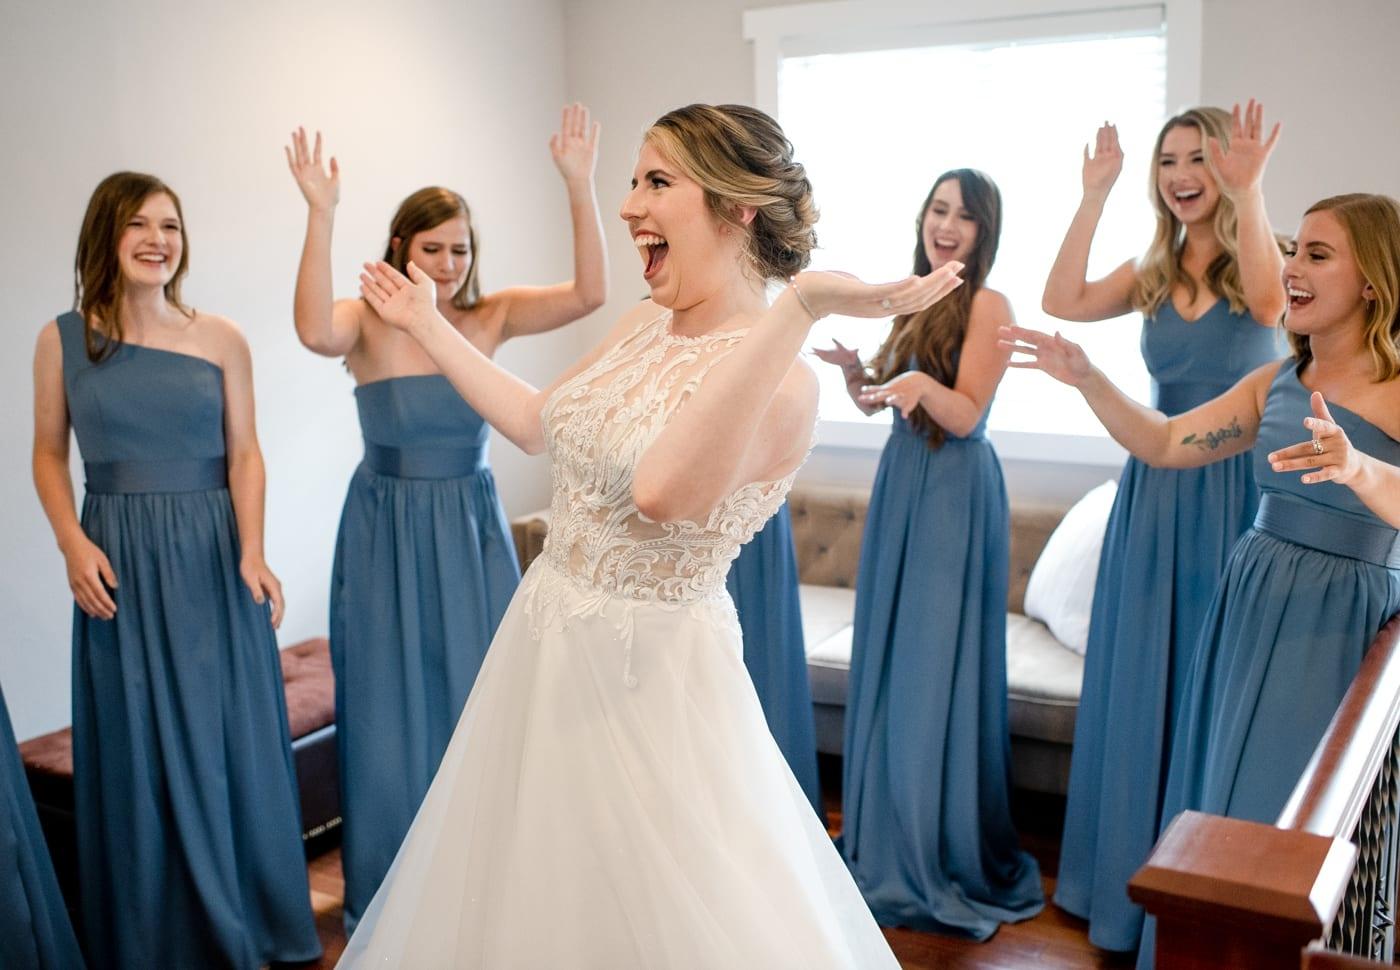 Wedding-Dress-Reveal-Trinity-Tree-Farm-Wedding-Photos-Greener-Visuals